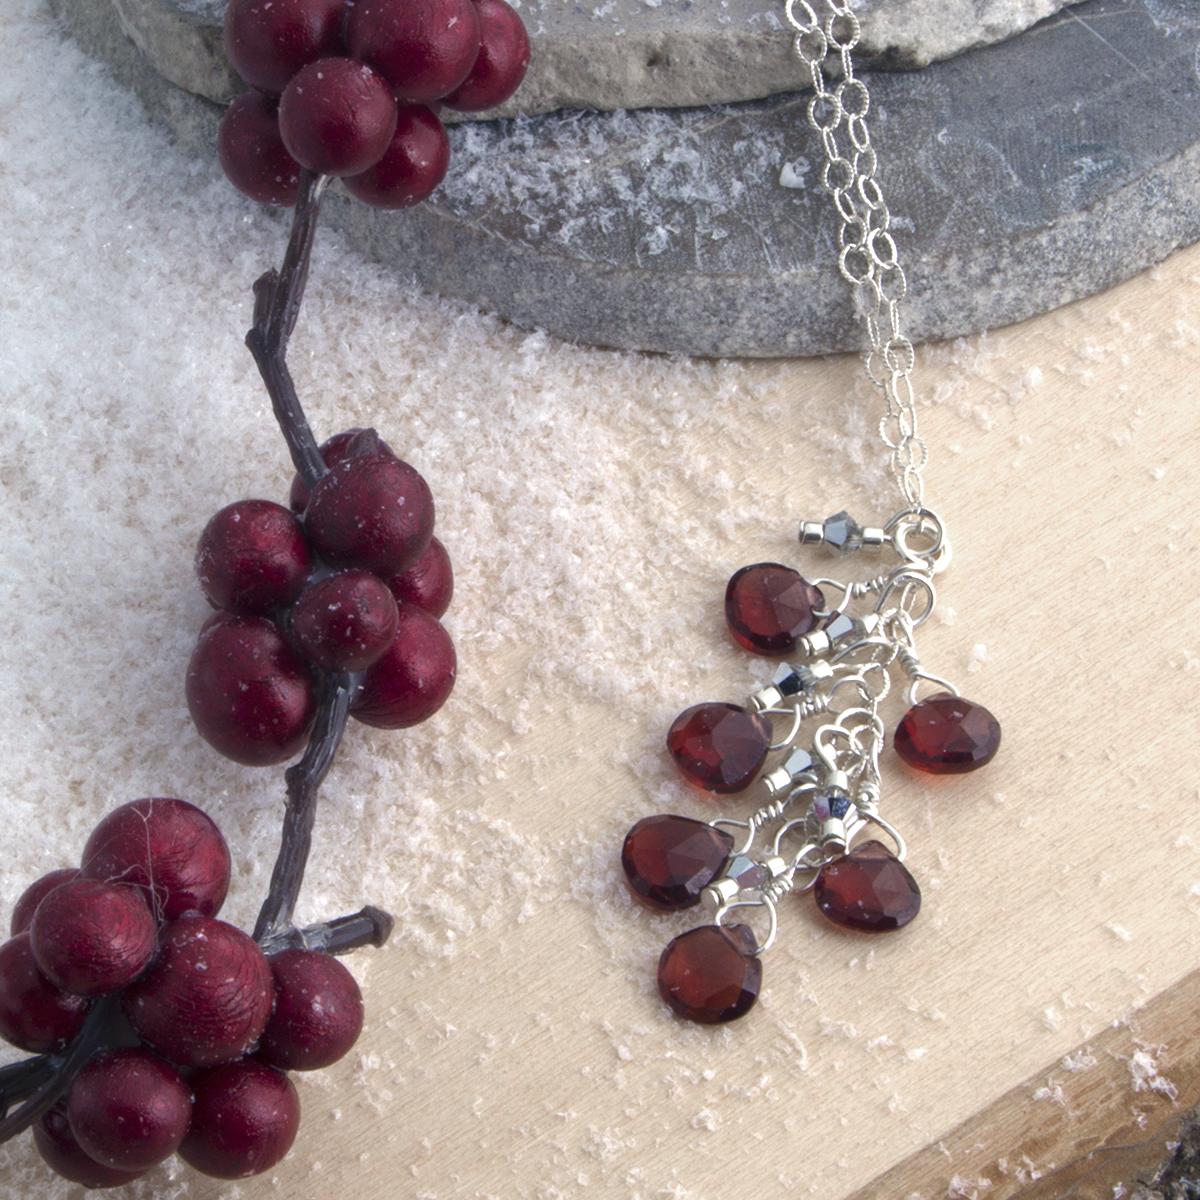 Like winter berries against white winter snow, Garnet sure does pop!